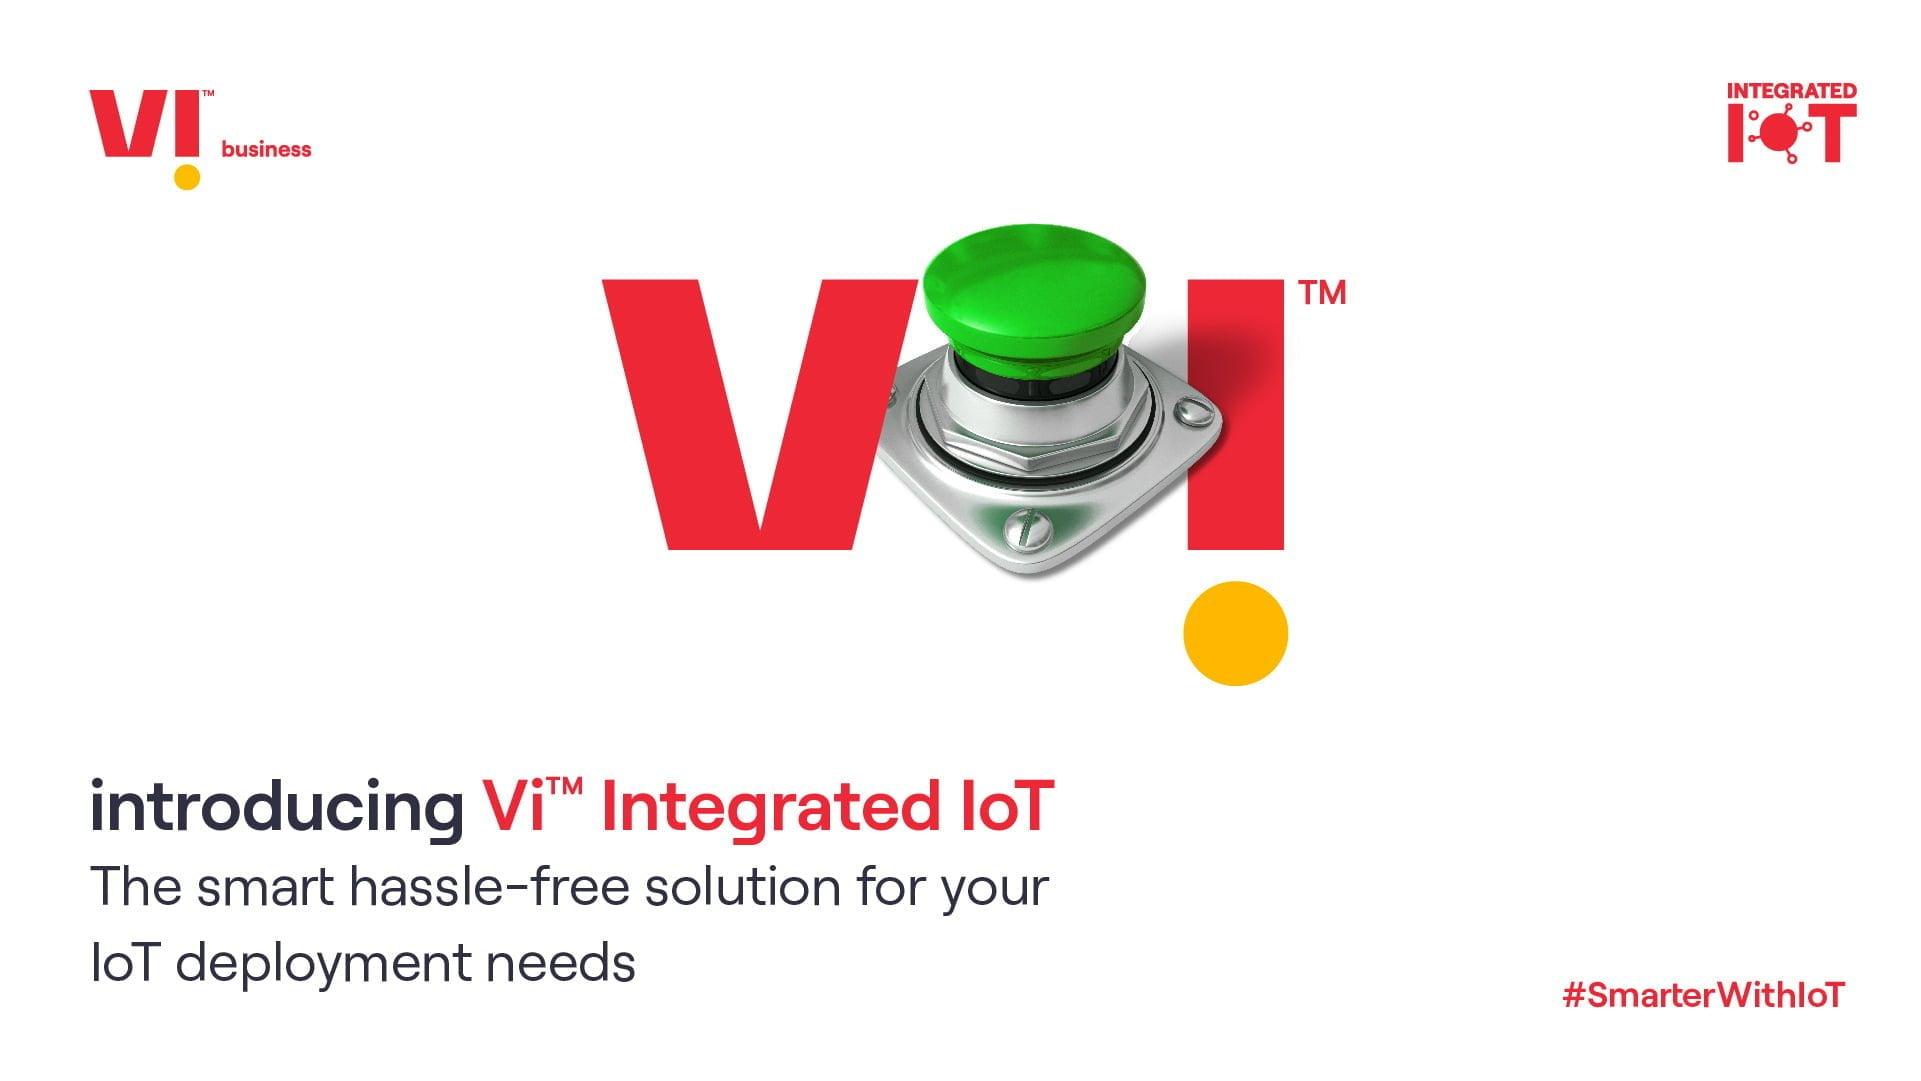 Vi Integrated IoT